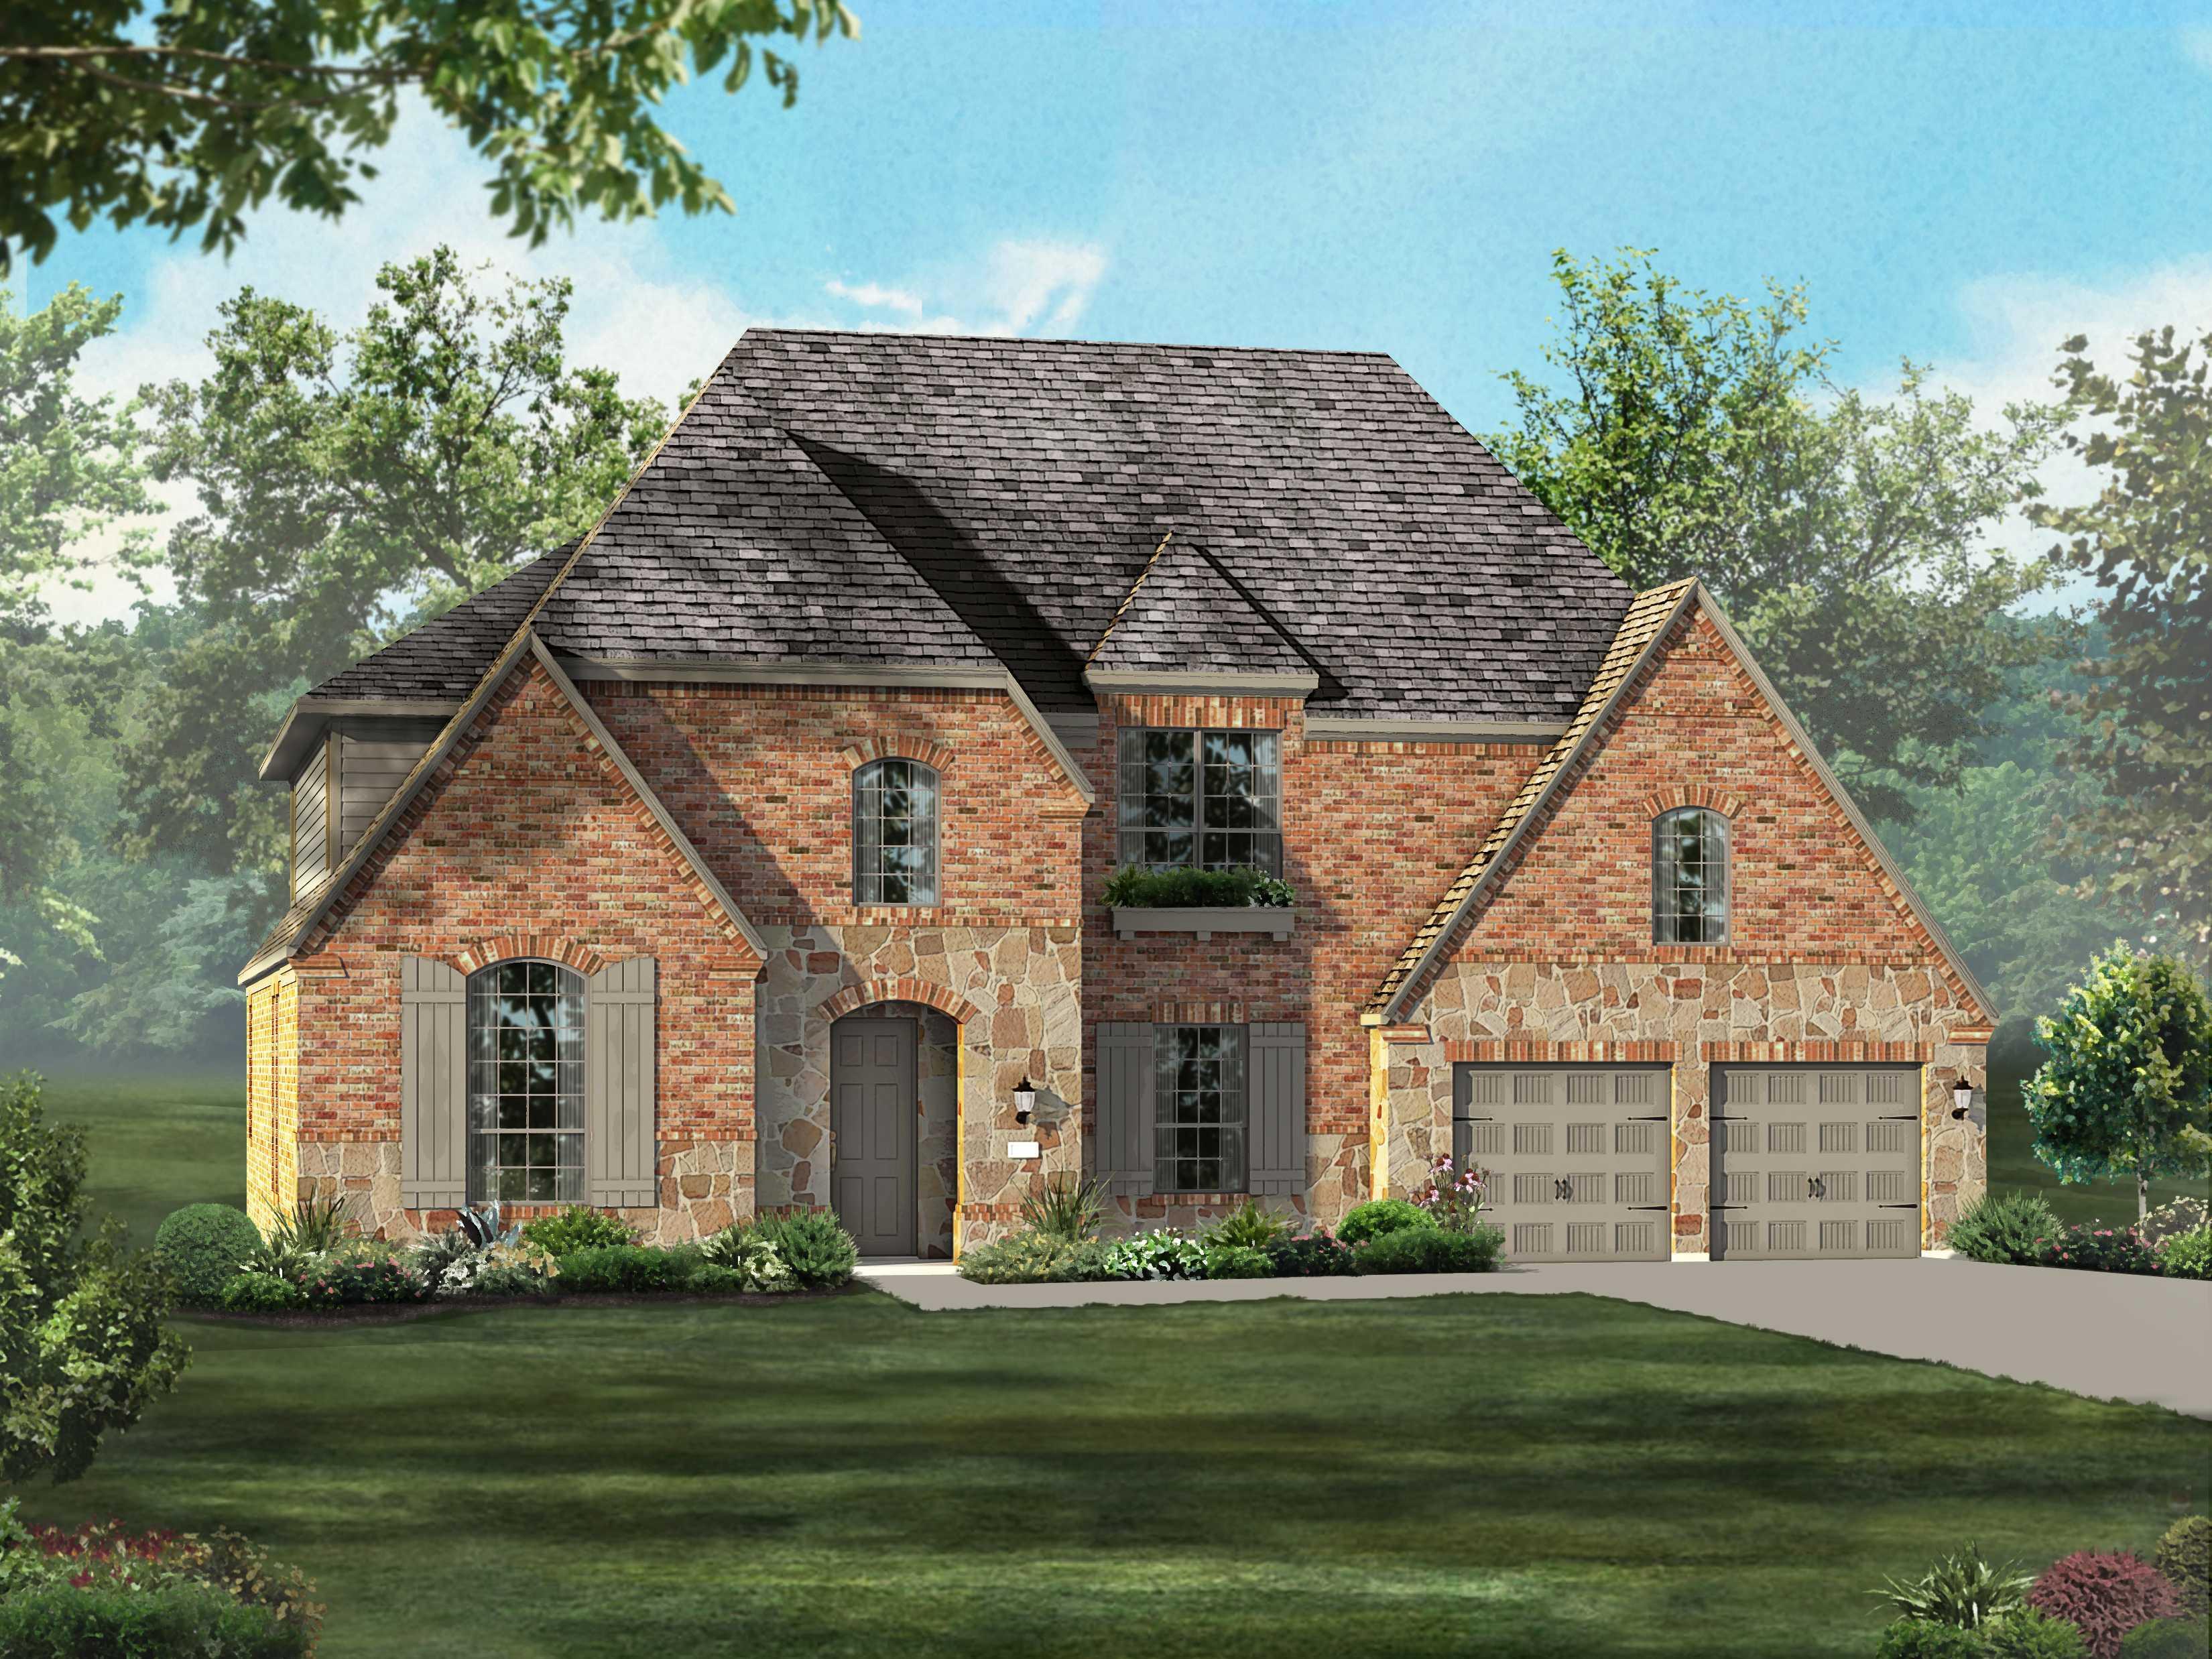 highland homes windsong ranch 75s plan 264 1329632 prosper tx new home for sale homegain